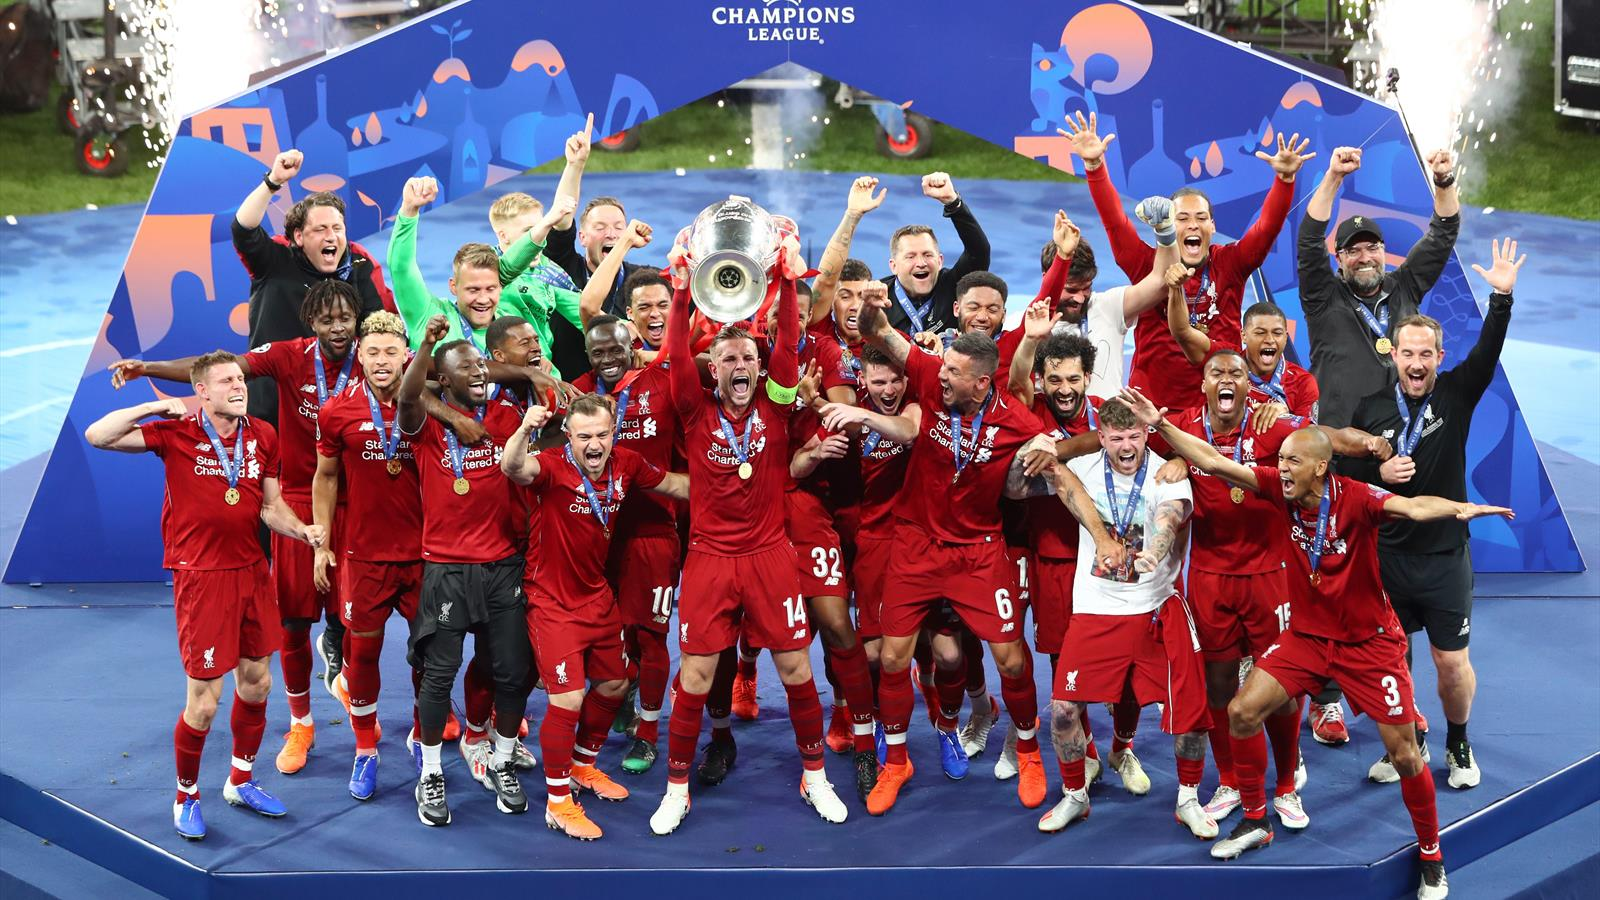 Champions League 2019 übertragung